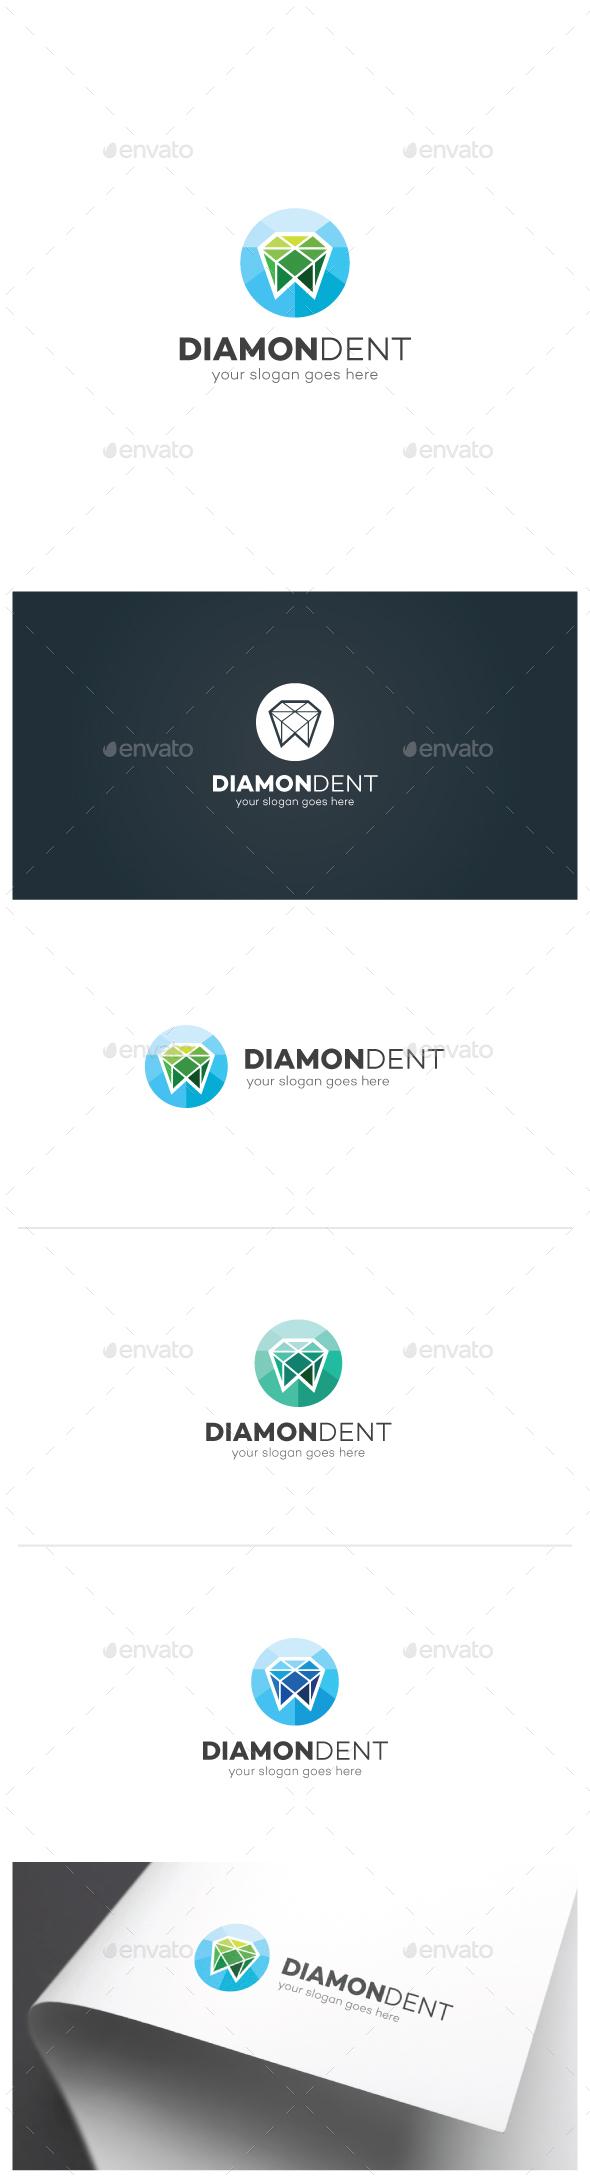 Diamond Tooth Logo - Objects Logo Templates